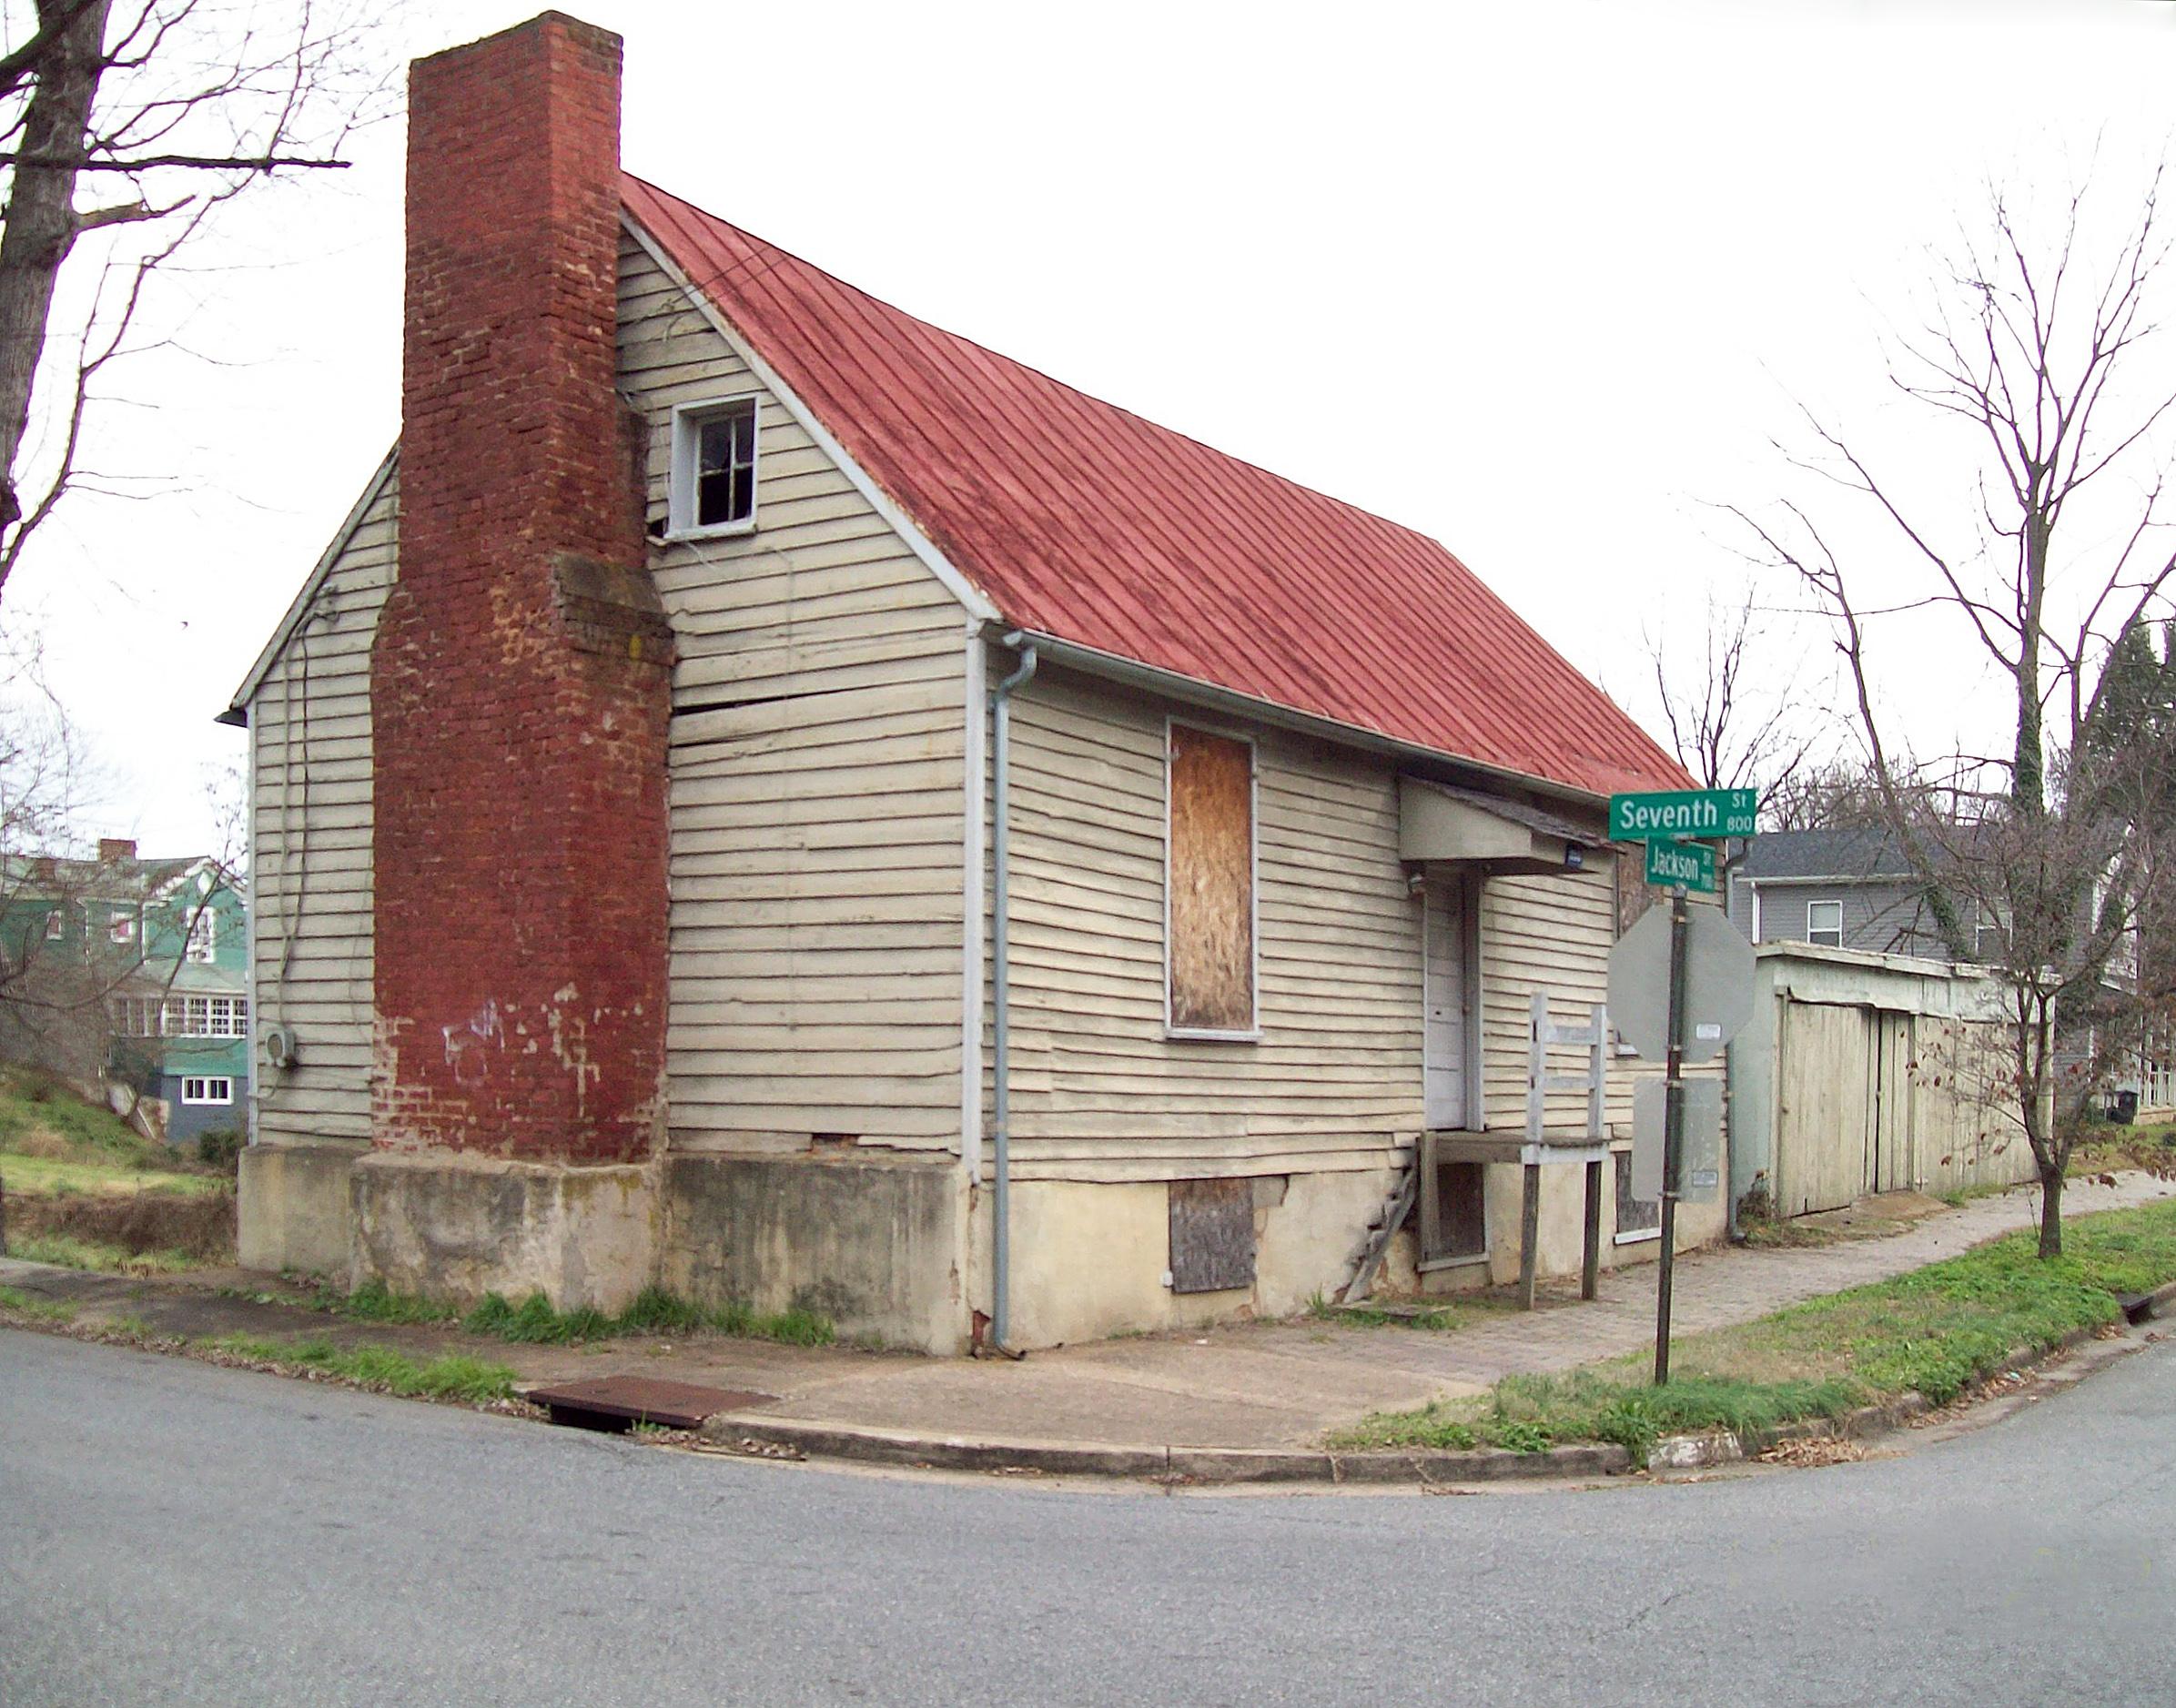 Lynch's Brickyard House